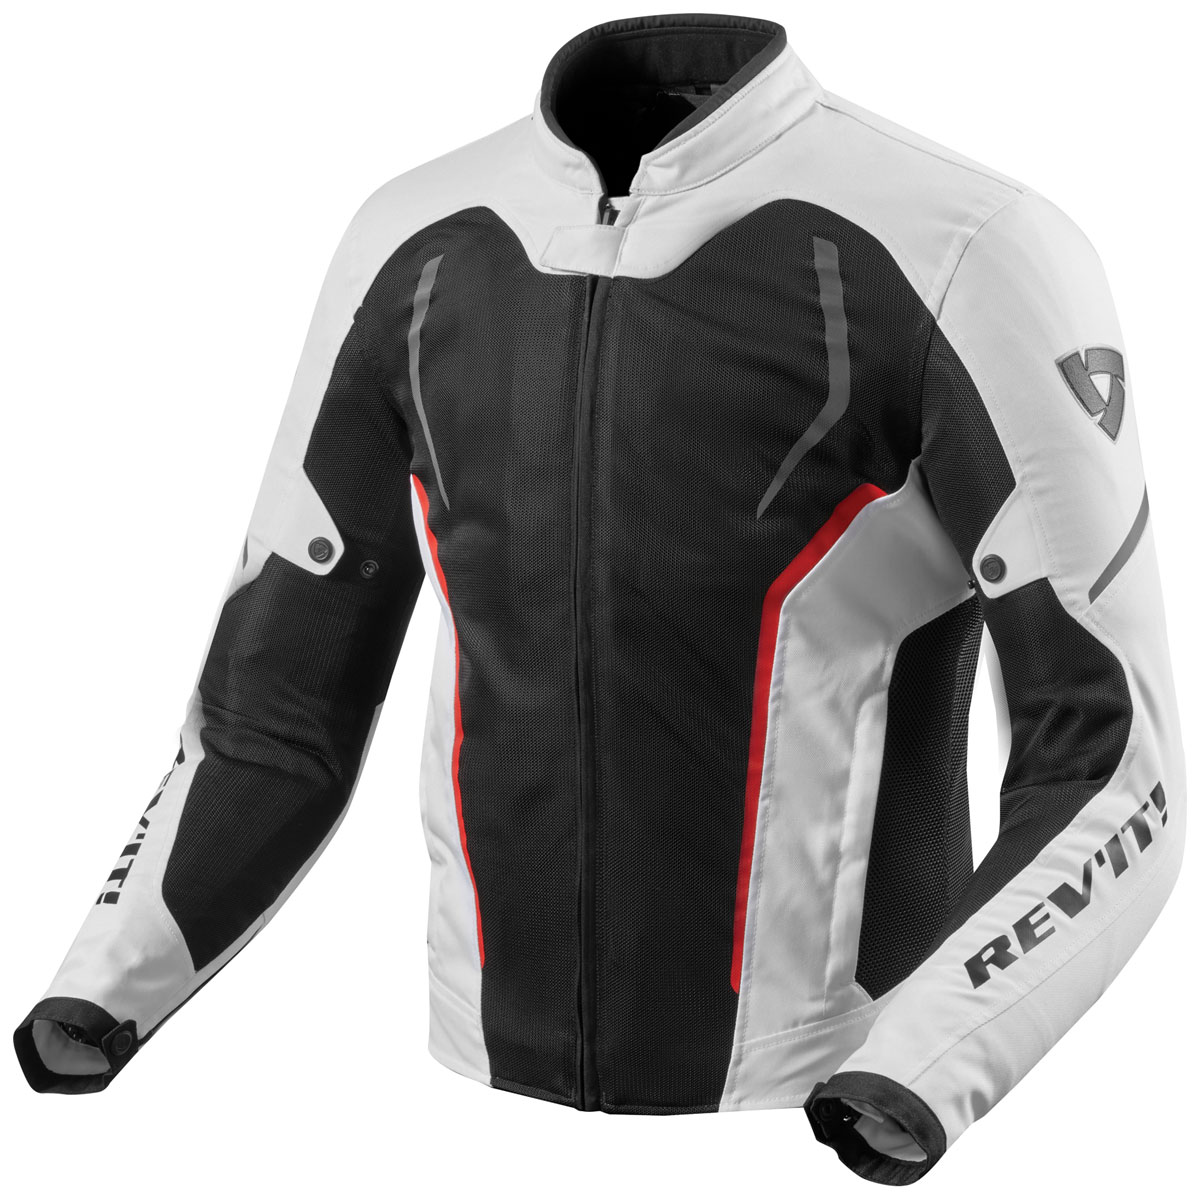 REV'IT! Men's GT-R Air 2 White/Black Jacket